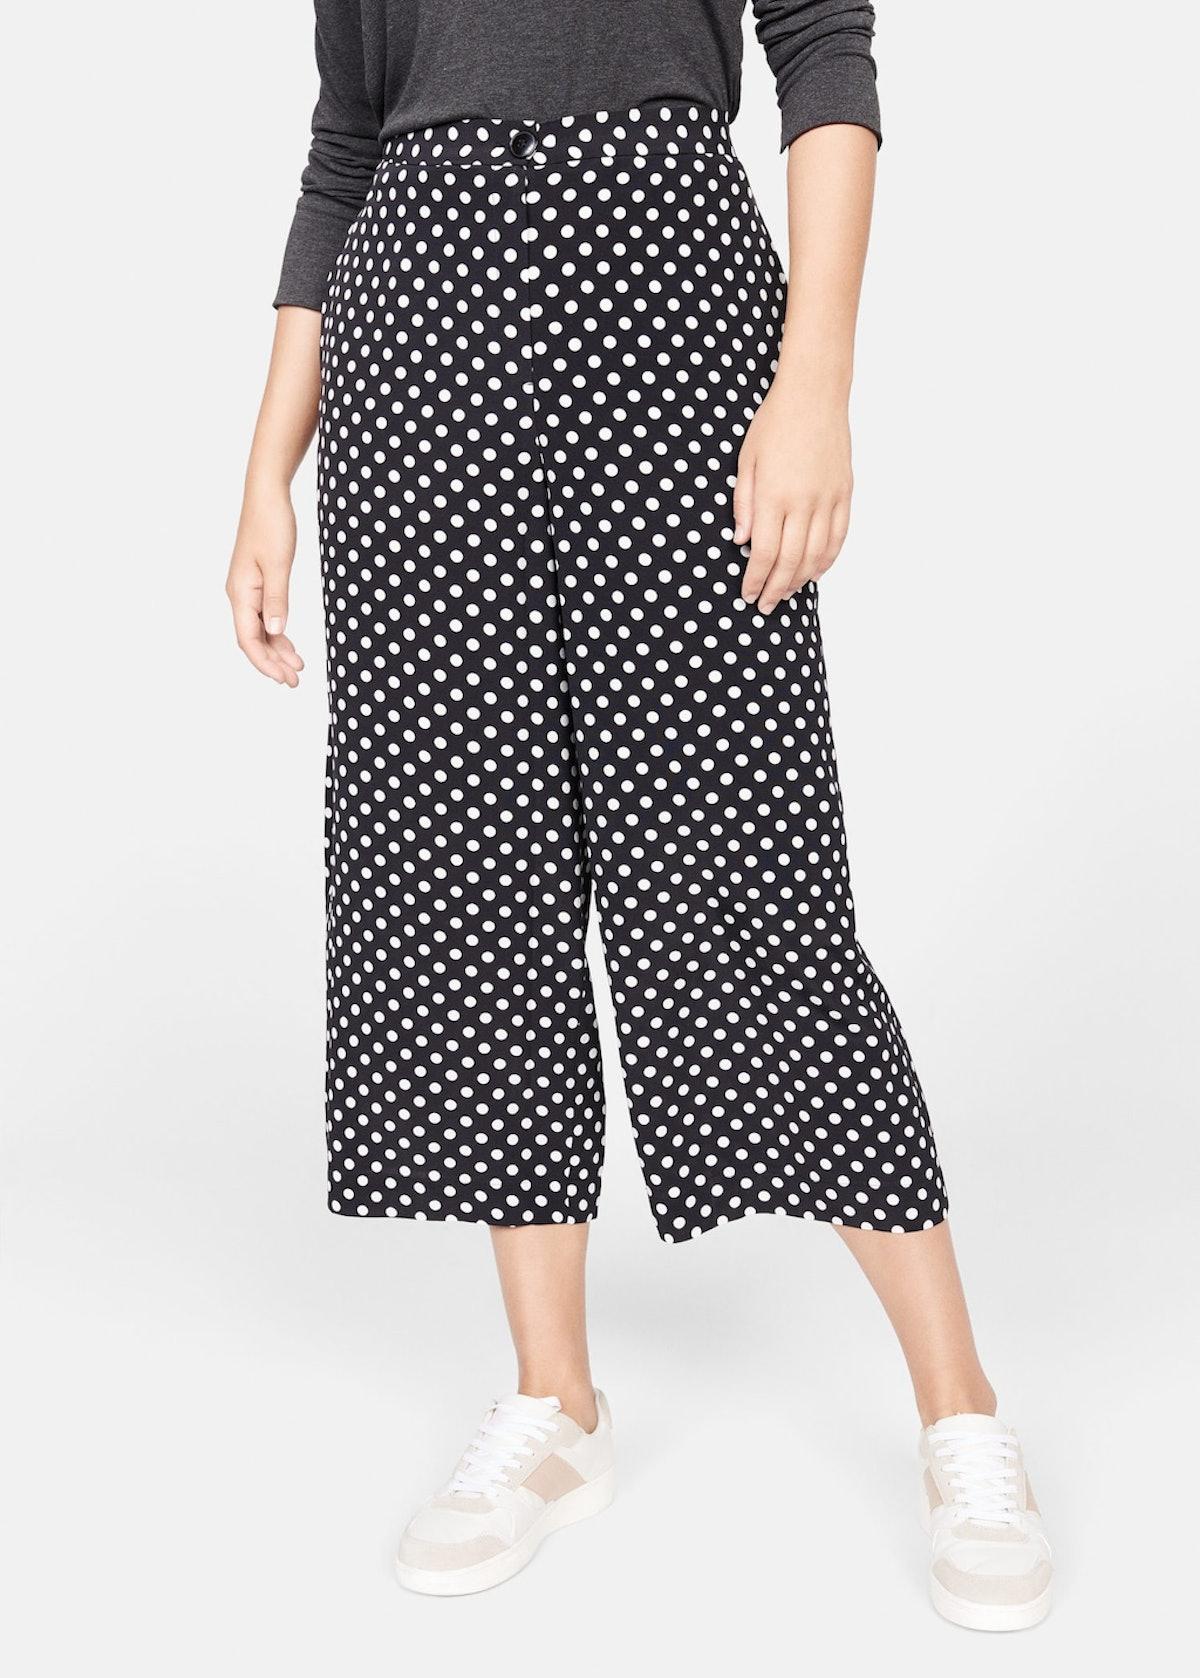 Polka-Dot Culottes Trousers